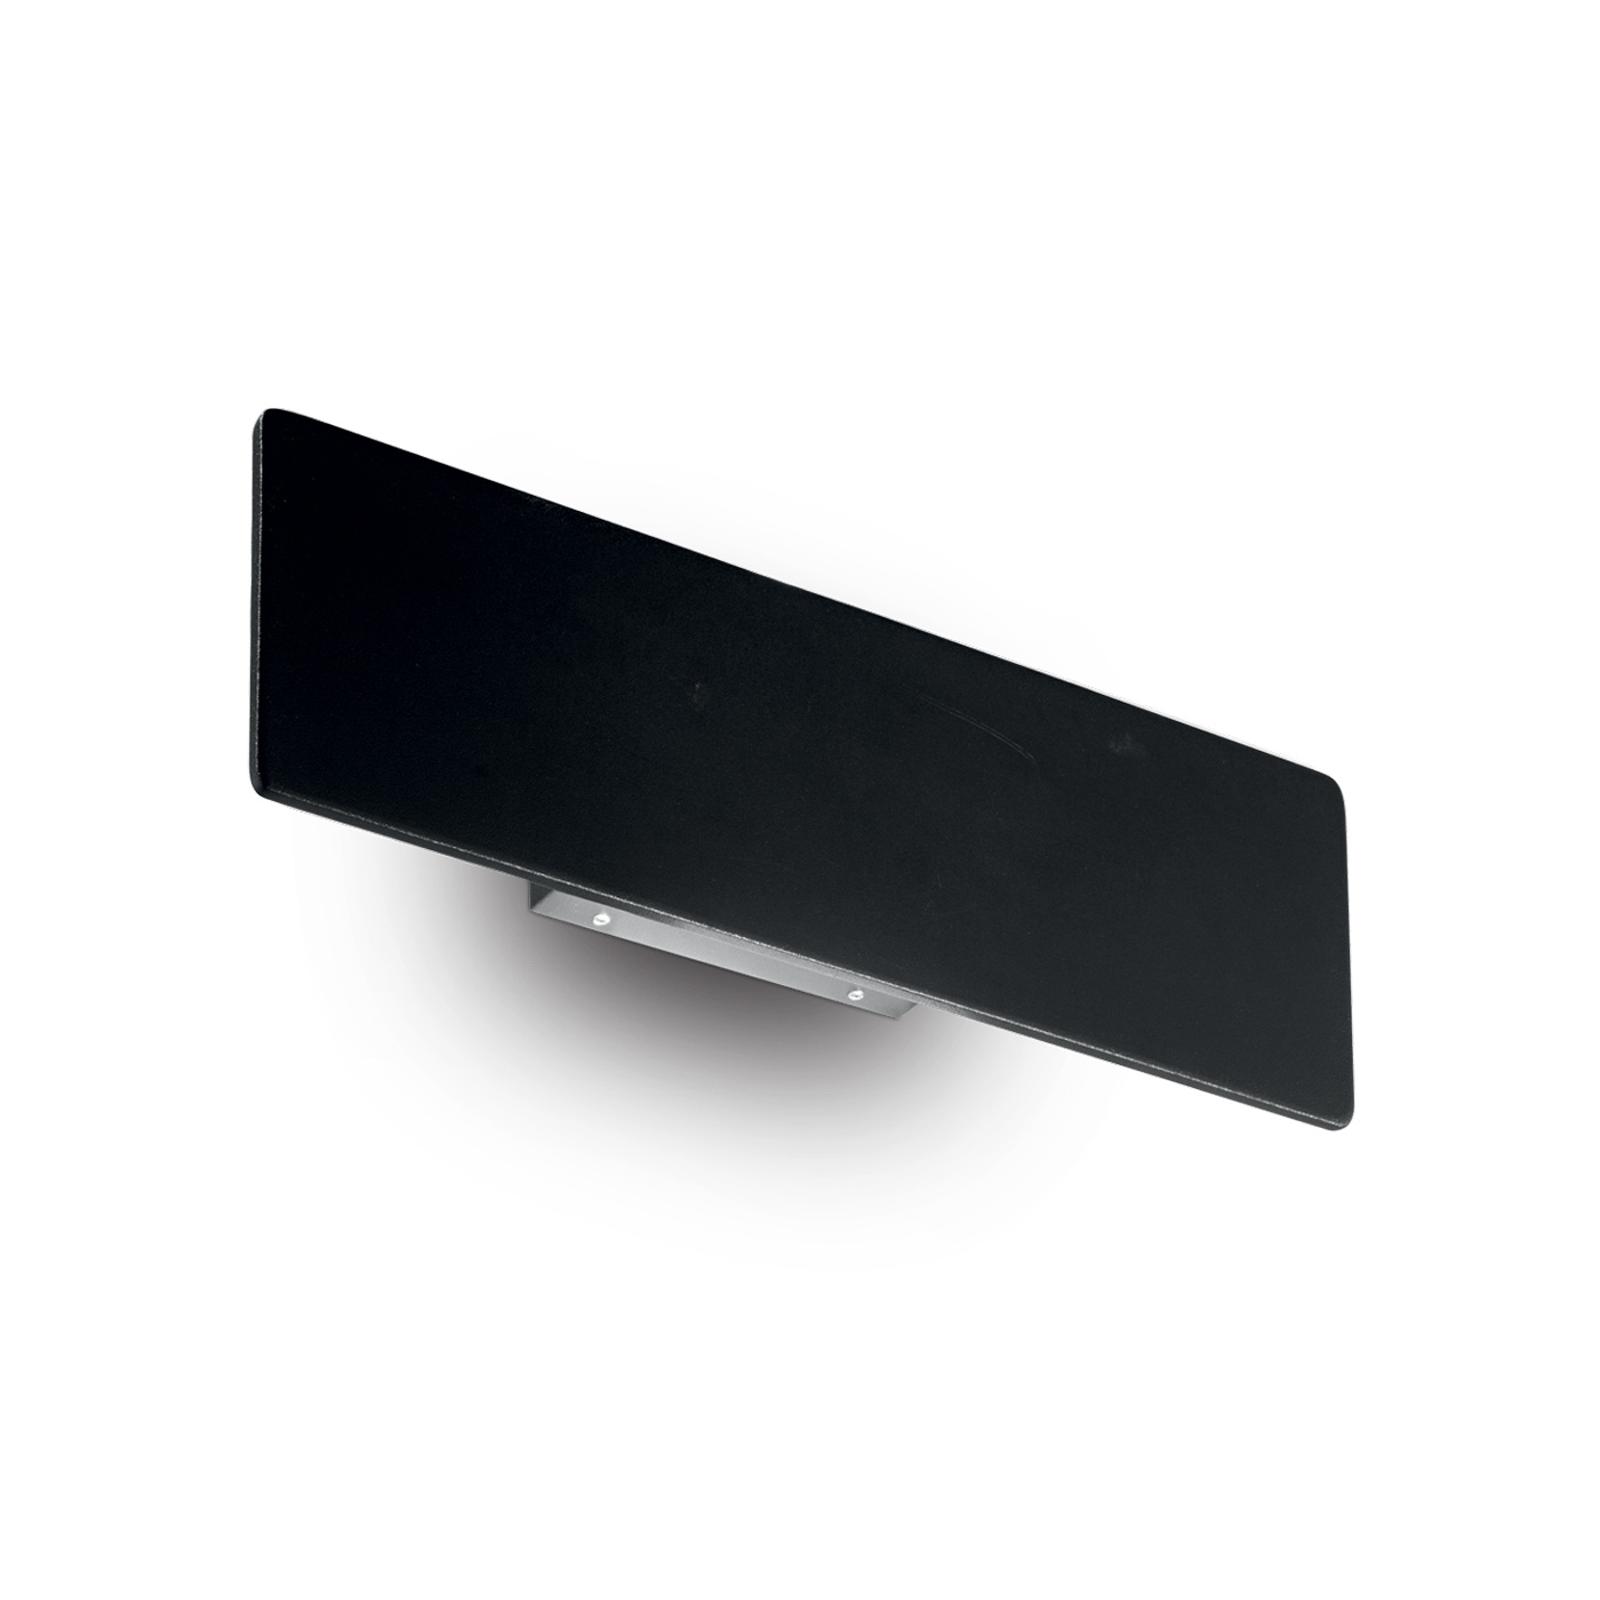 LED wandlamp Zig Zag zwart, breedte 29 cm